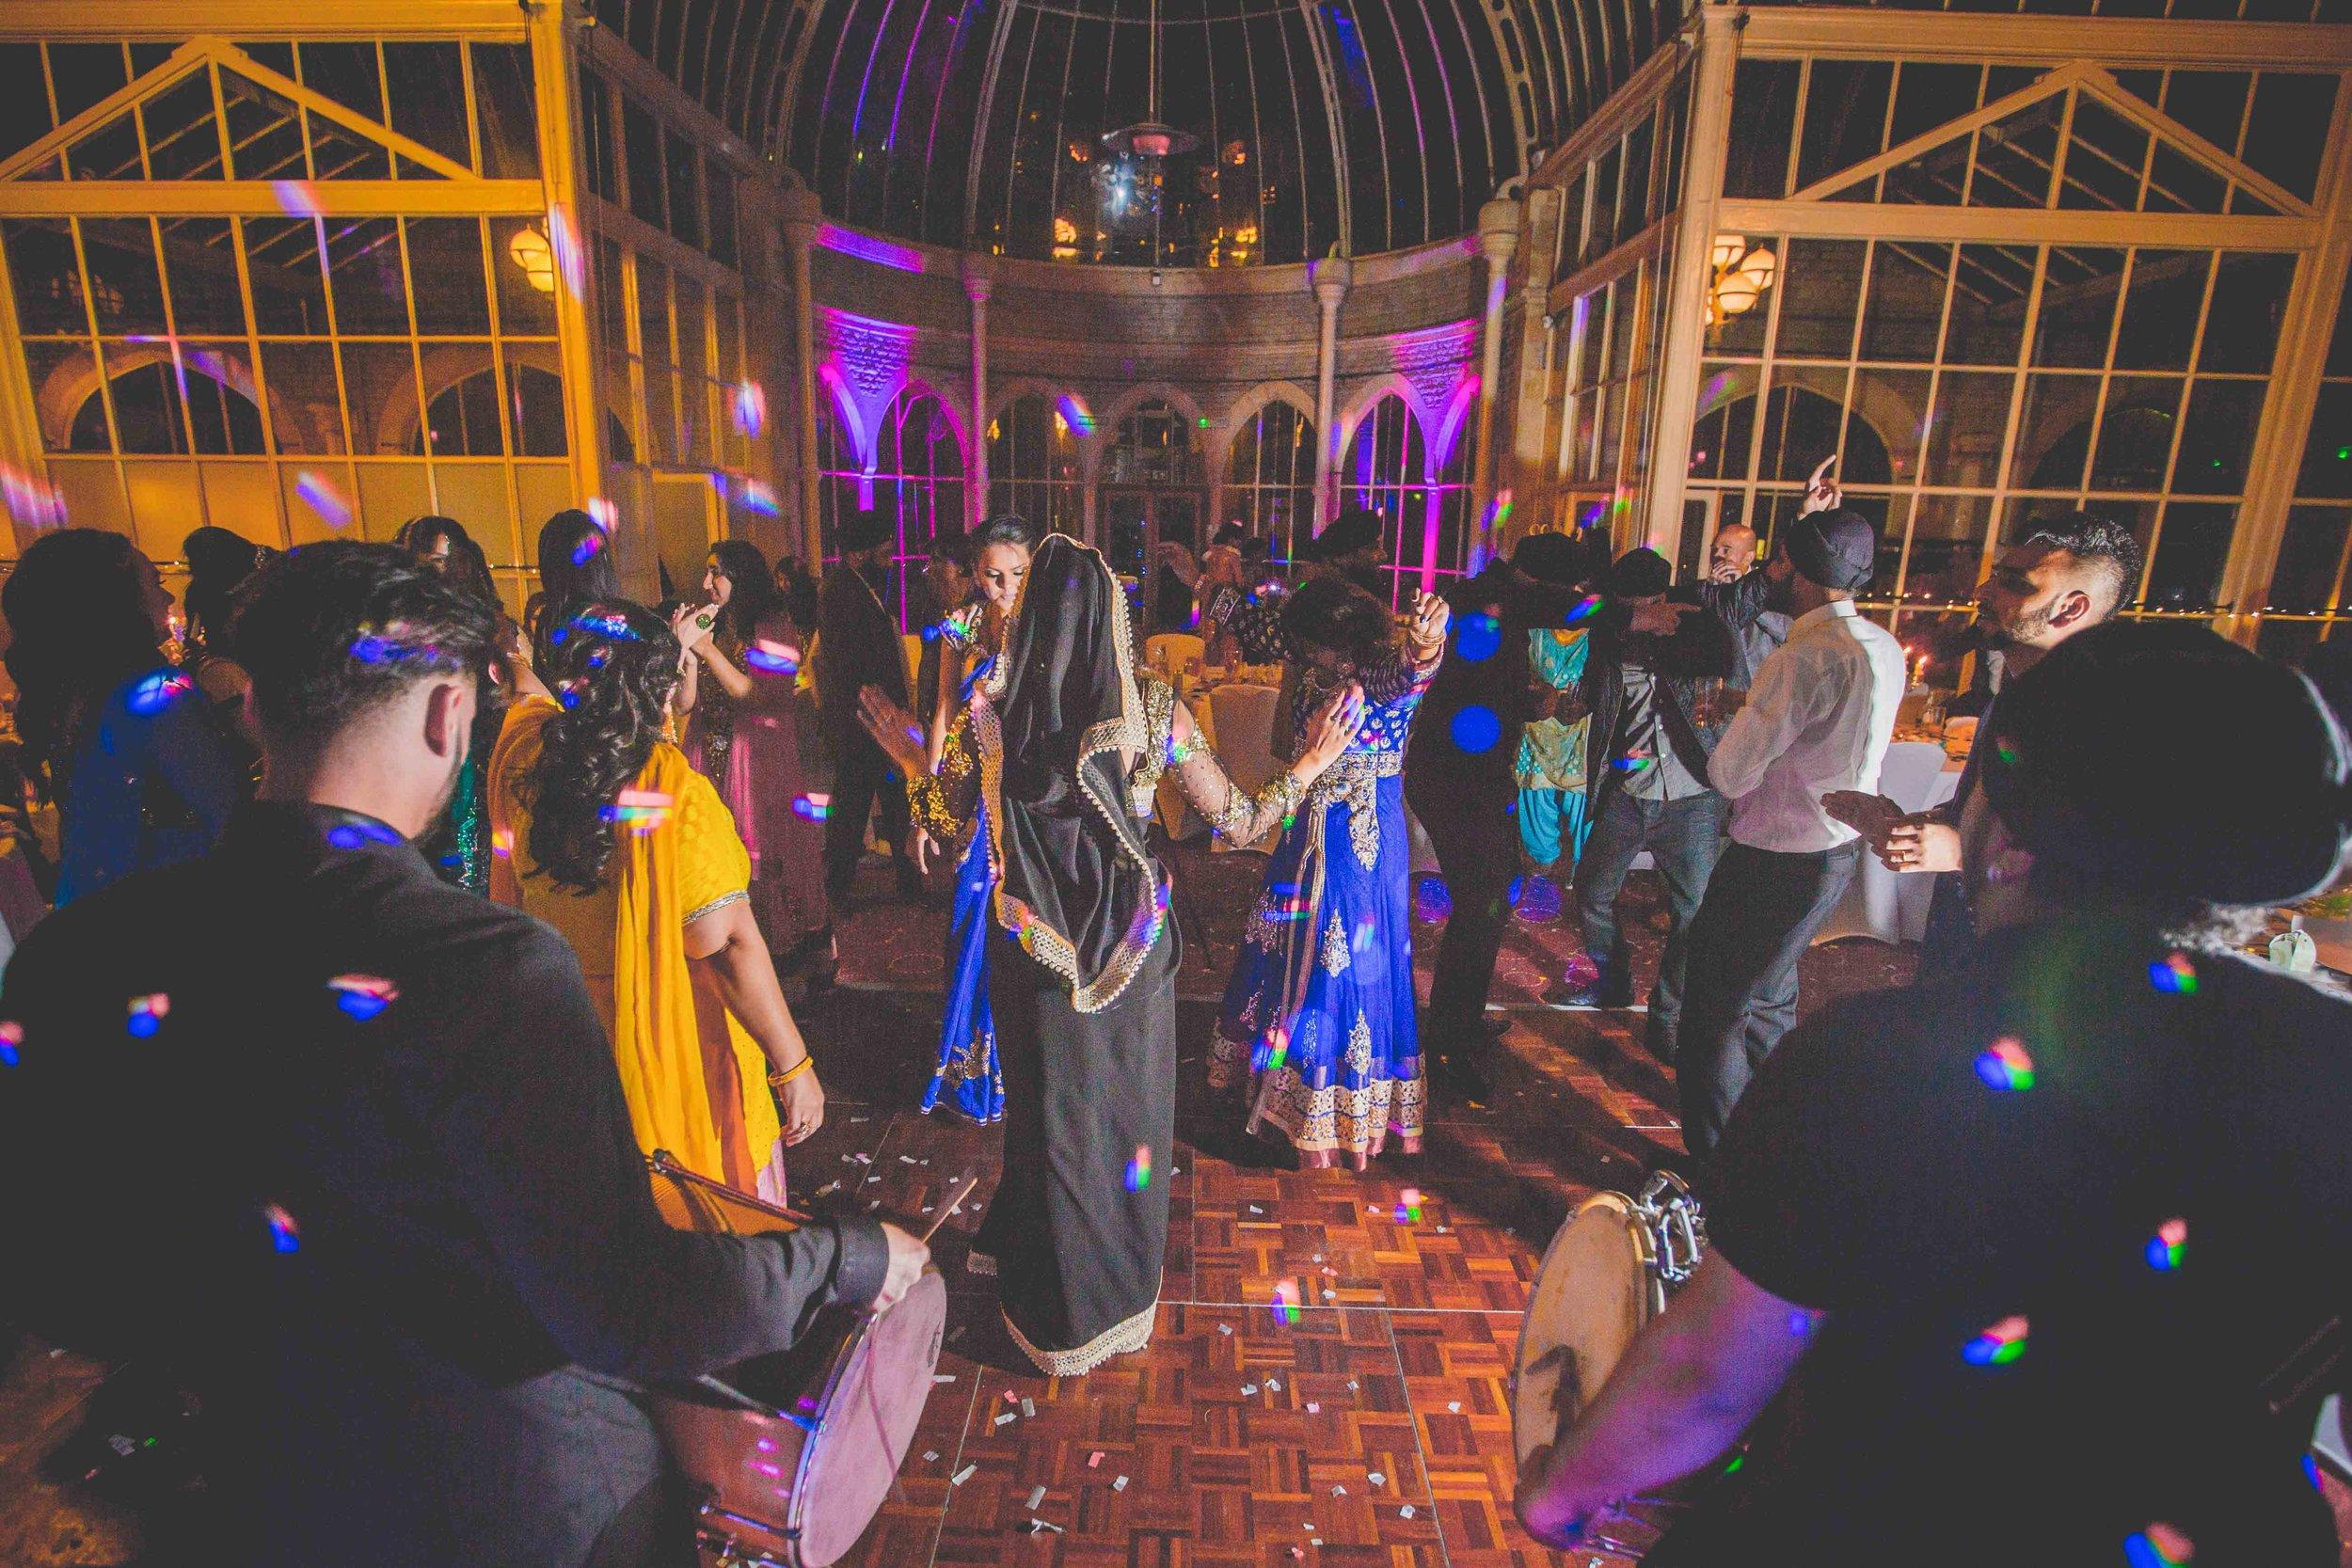 tortworth-Hotel-gloucester-birthday-wedding-photographer-natalia-smith-photography-42.jpg